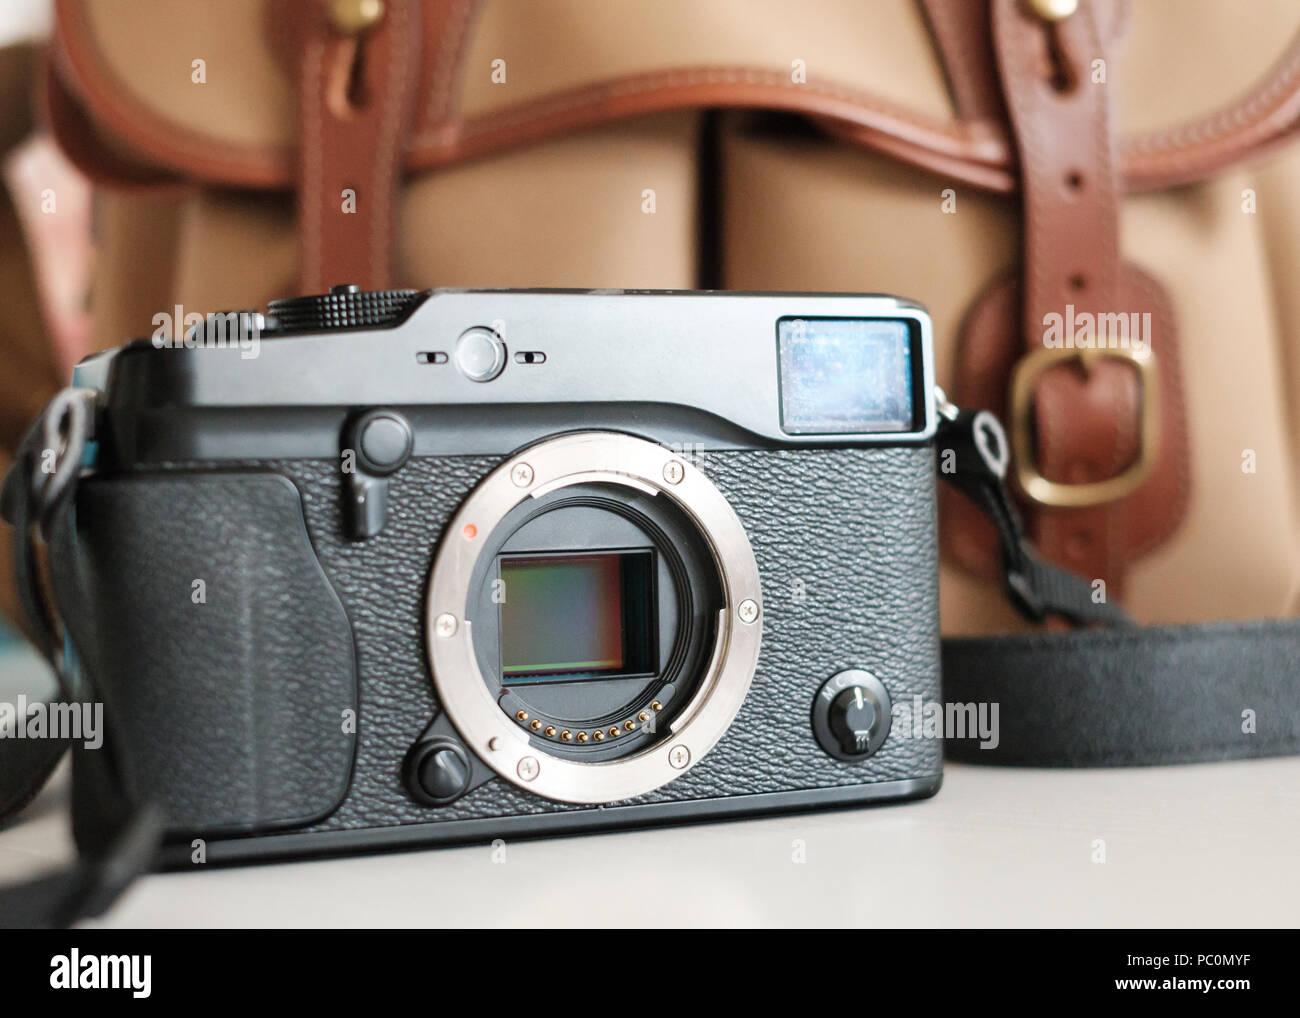 Fuji Mirrorless system camera with sensor visible, with billingham camera bag Stock Photo